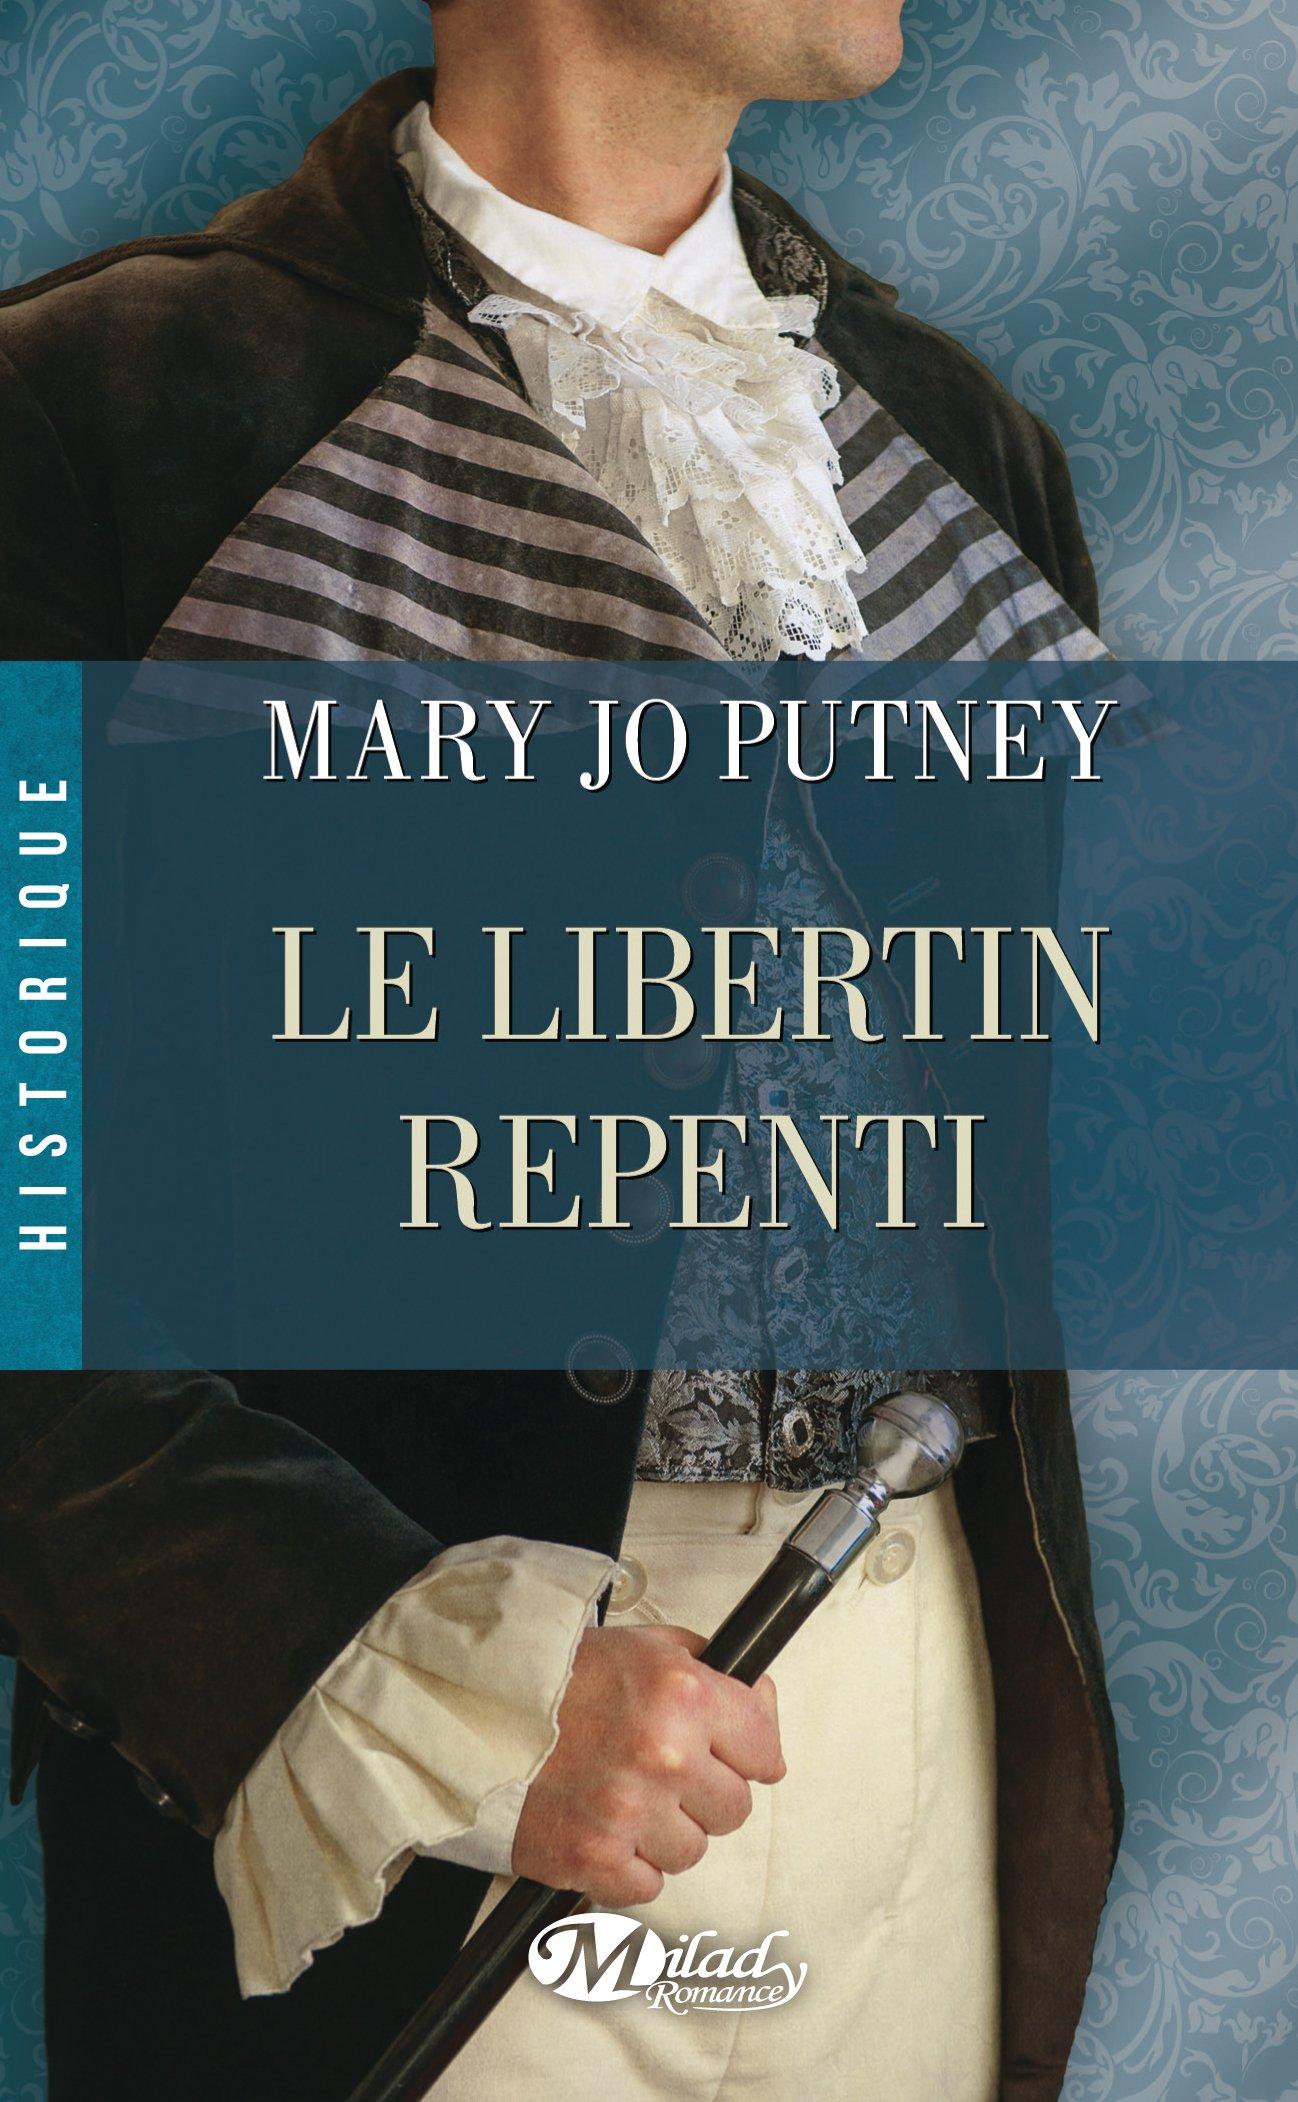 putney - Le libertin repenti de Mary Jo Putney 81ybYTP0v-L